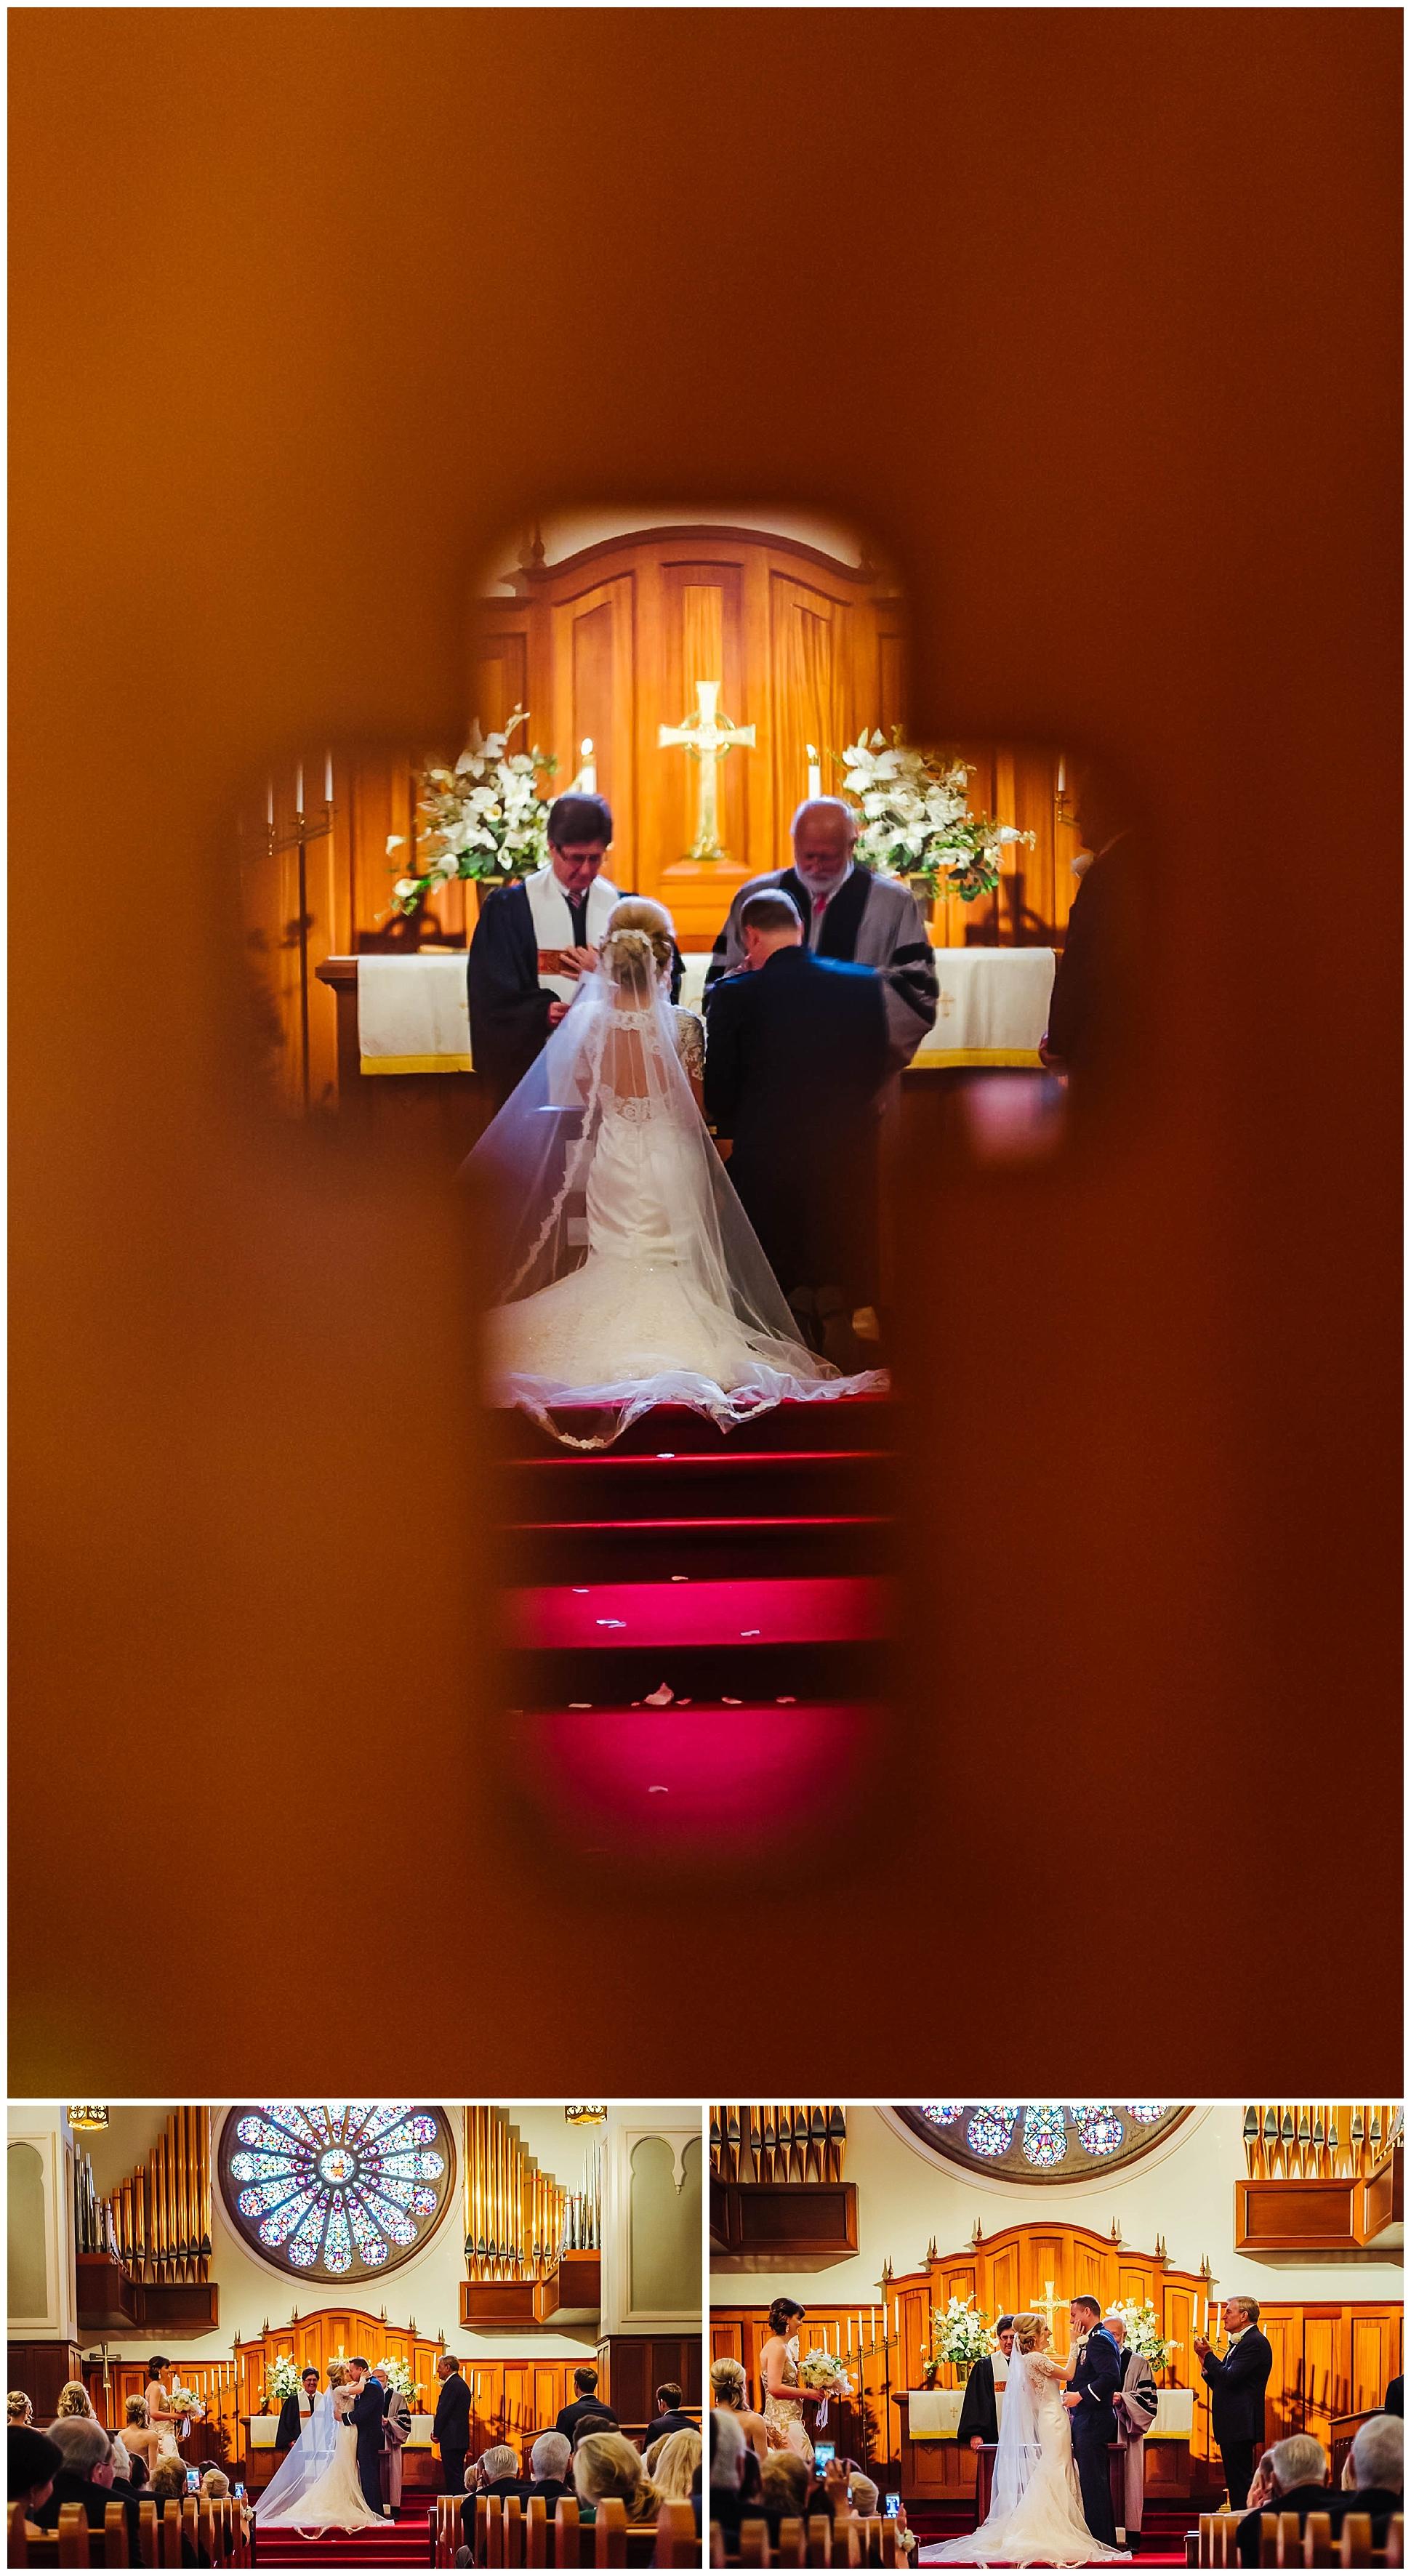 tampa-wedding-photographer-sleeves-palma-ceia-country-club-golf-course-sunset-luxury_0048.jpg